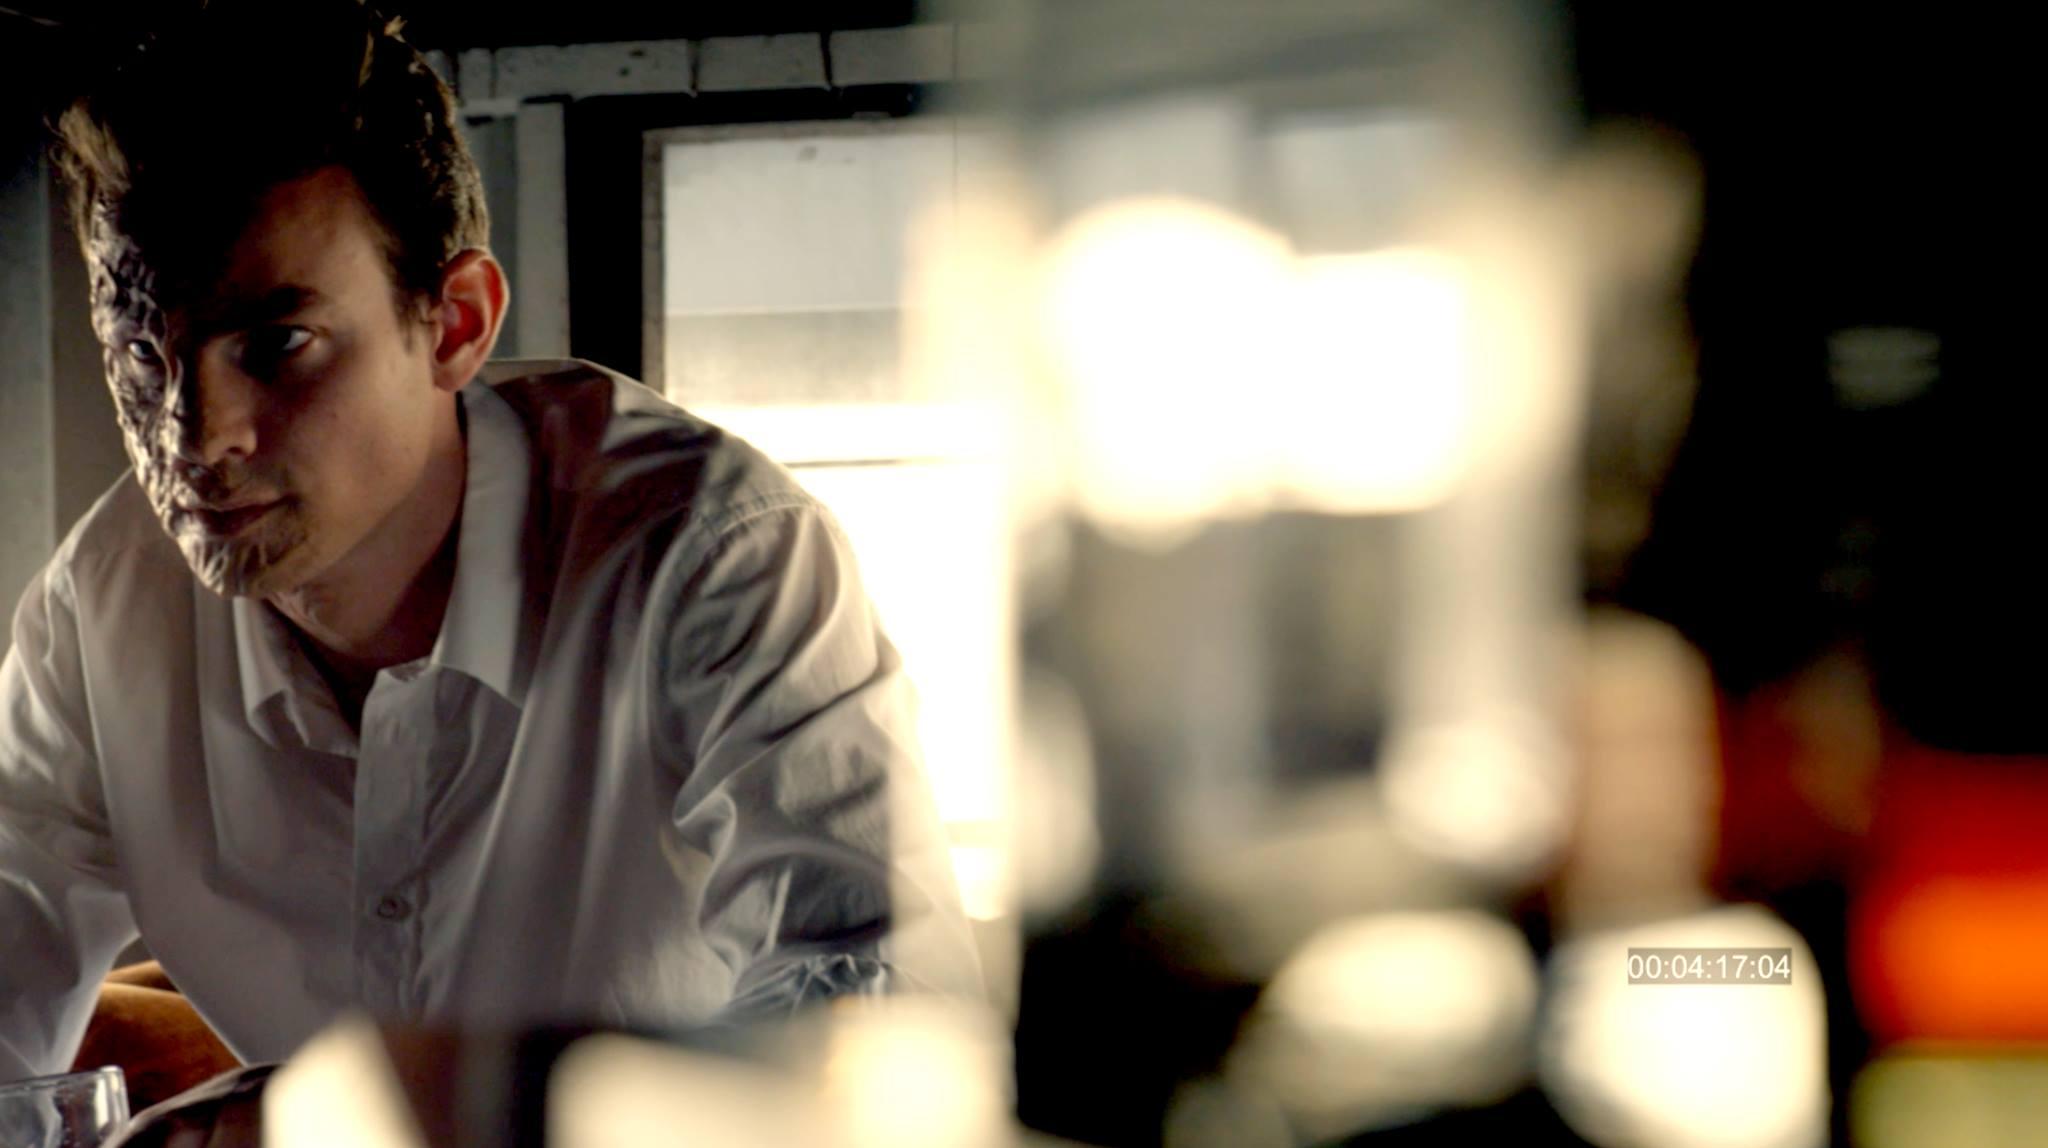 Luke Cook as Oliver Sten ruminating in Intricate Vengeance